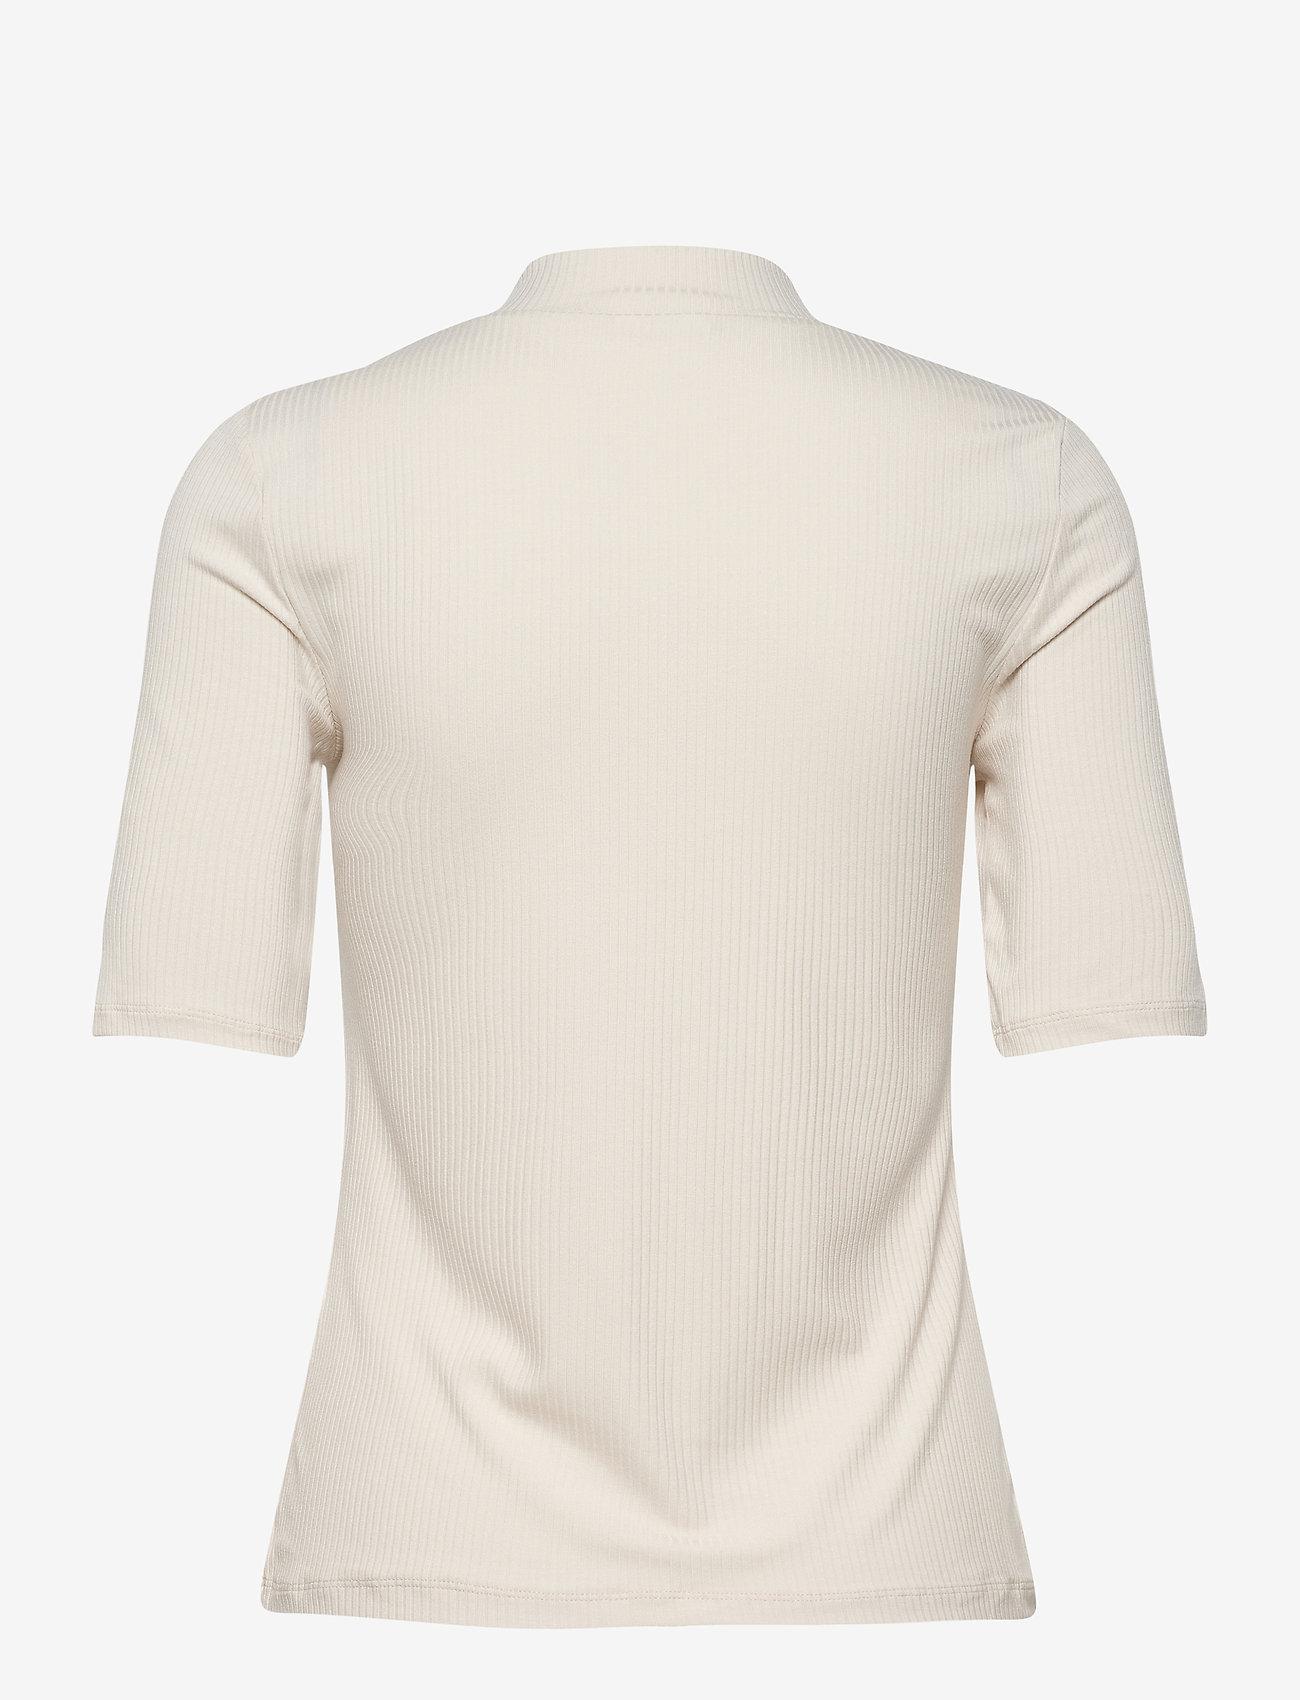 Vila - VISOLITTA RIB FUNNELNECK 2/4 TOP/SU-NOOS - t-shirts - birch - 1